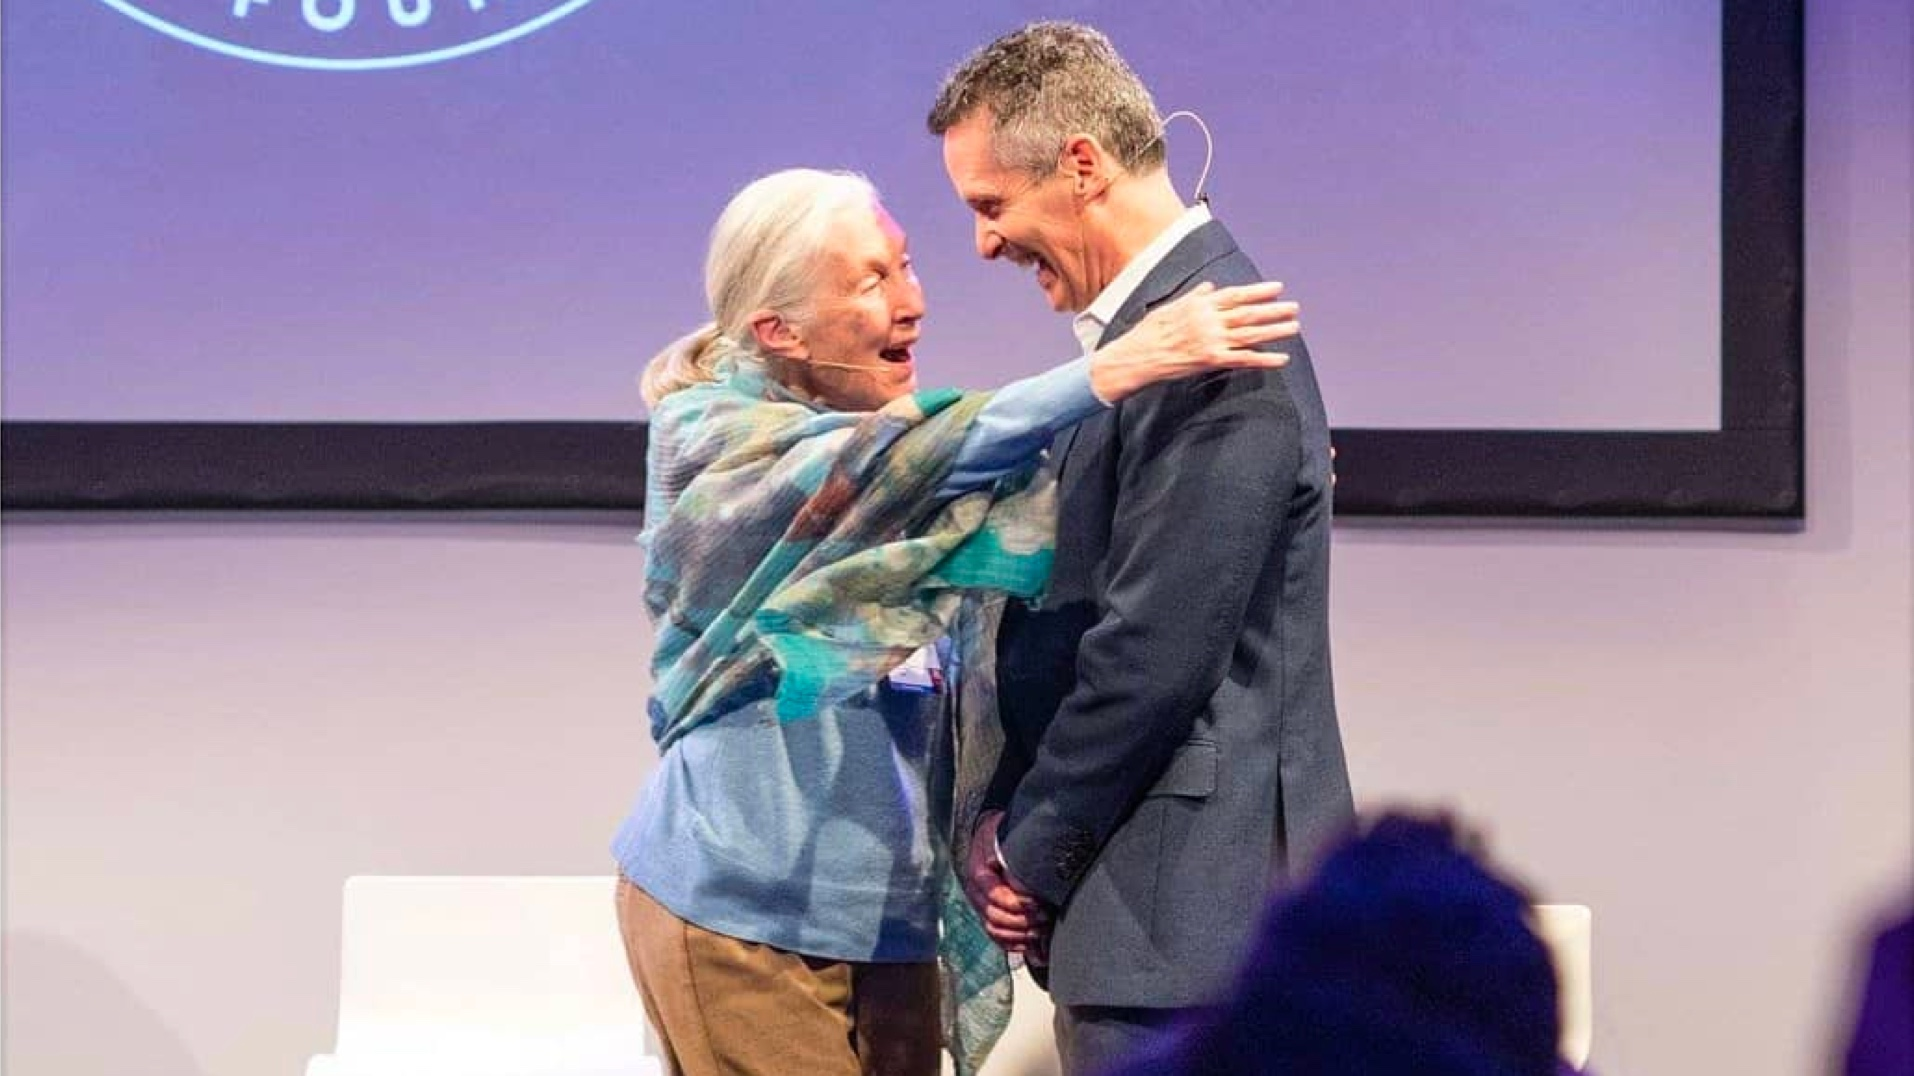 Jane Goodall abraçando Dan Springer